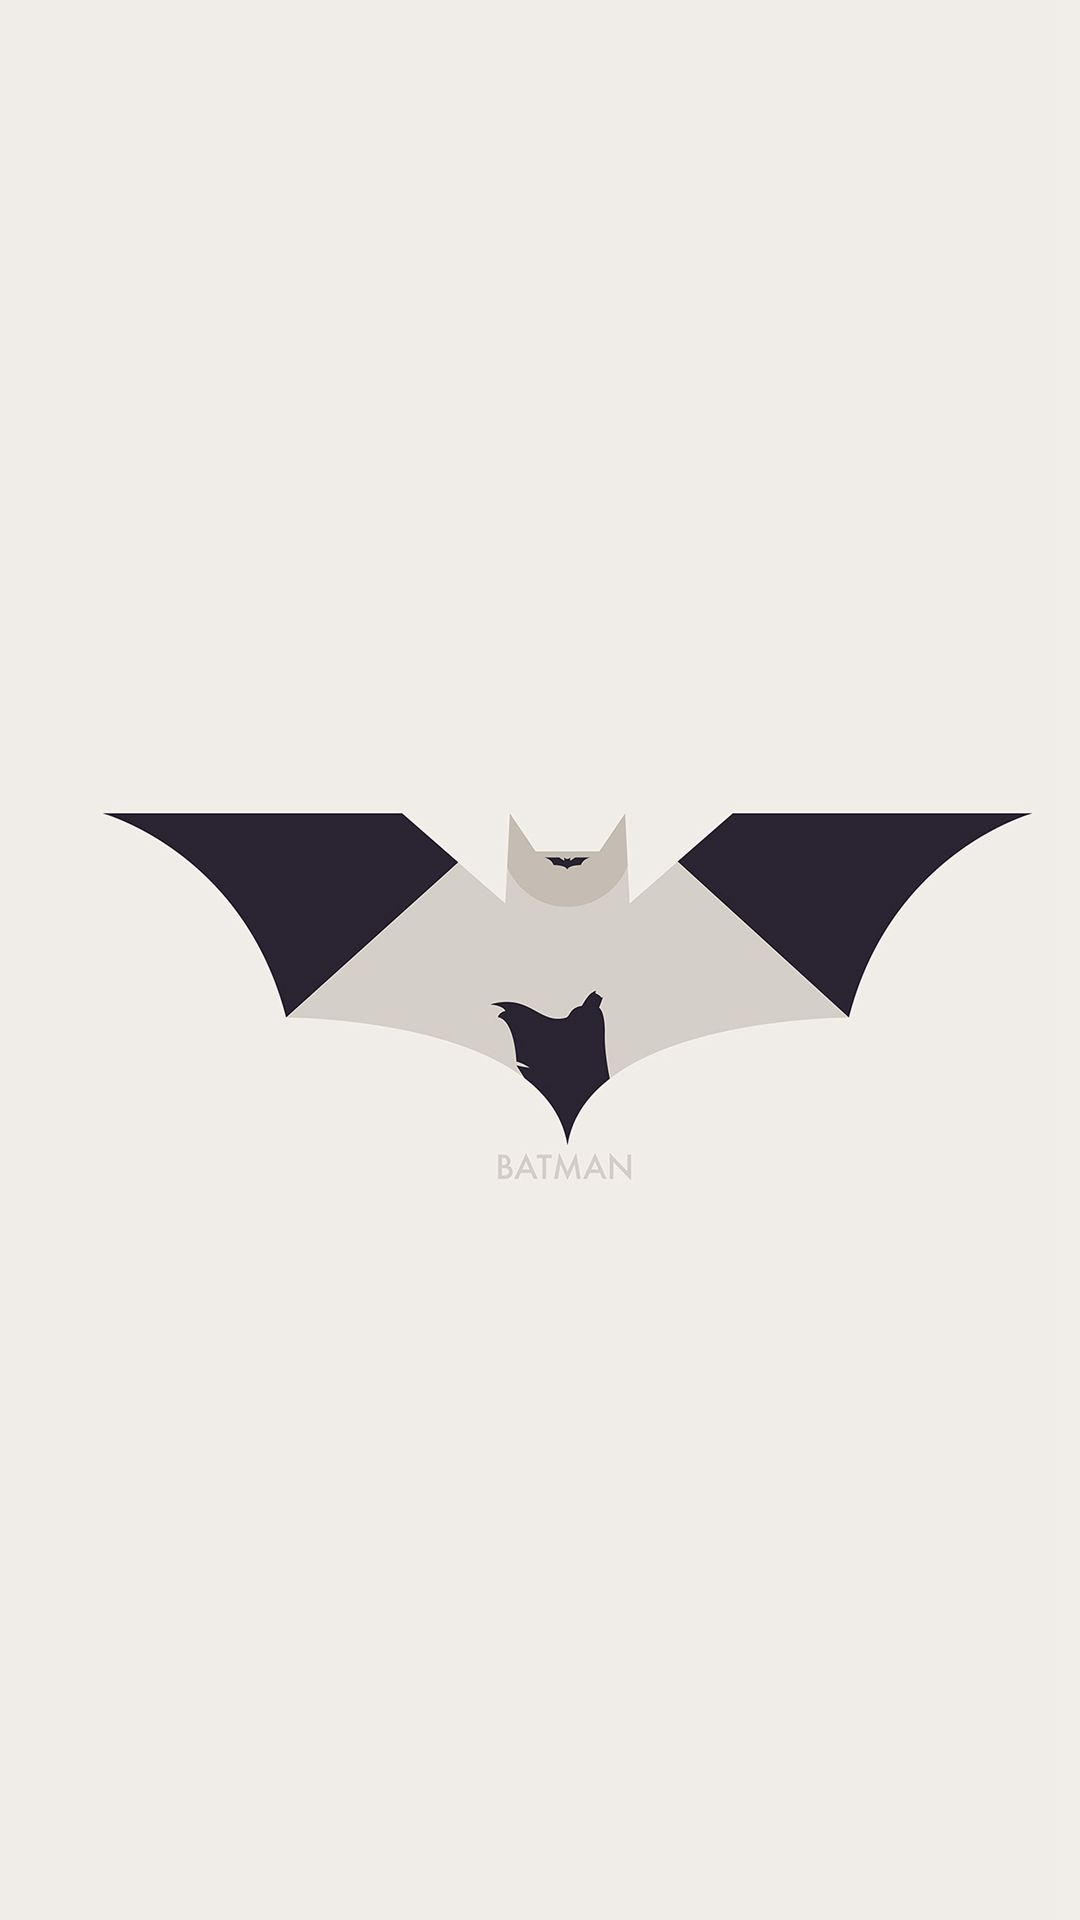 Art Batman Minimal Logo Illust Iphone 6 Wallpaper Batman